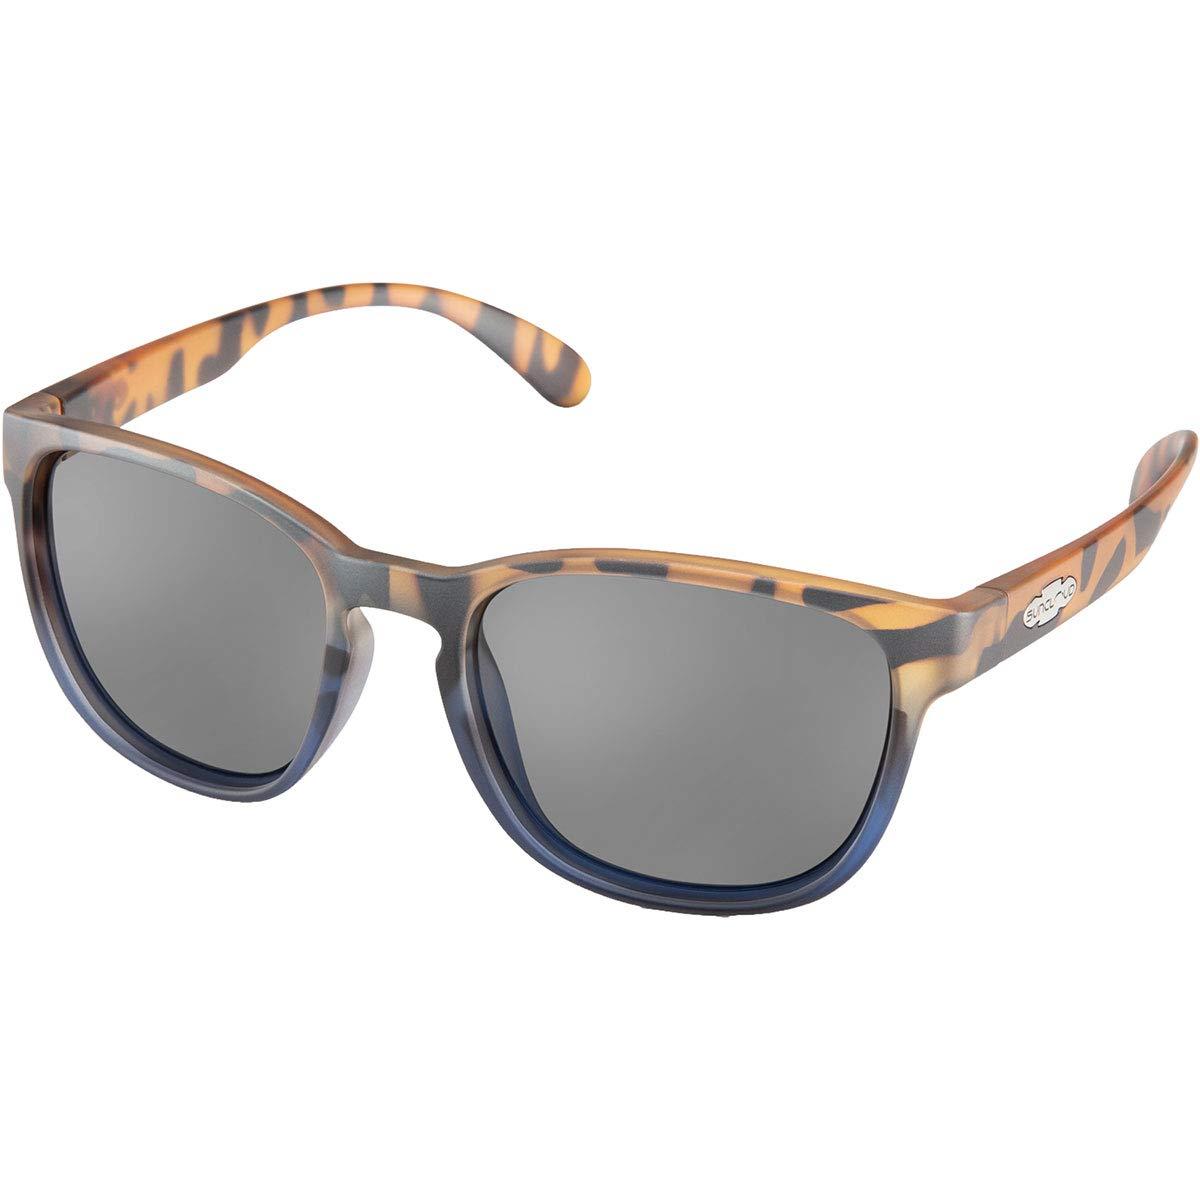 Loveseat Polarized Sunglasses